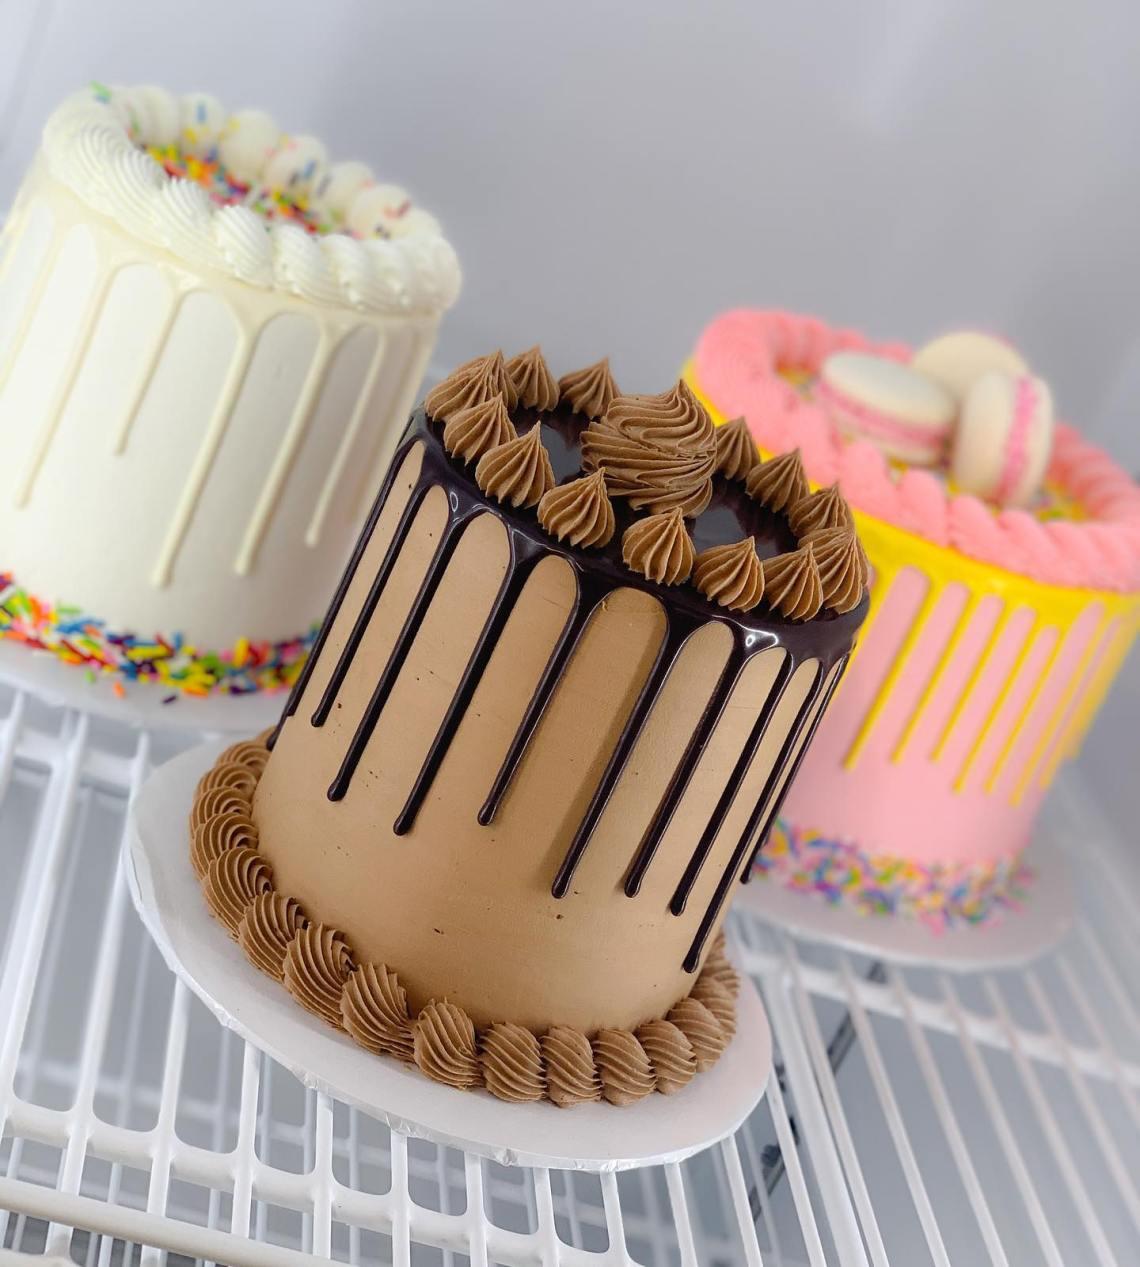 Custom Birthday Cakes in Miami by Lil Chef Jen